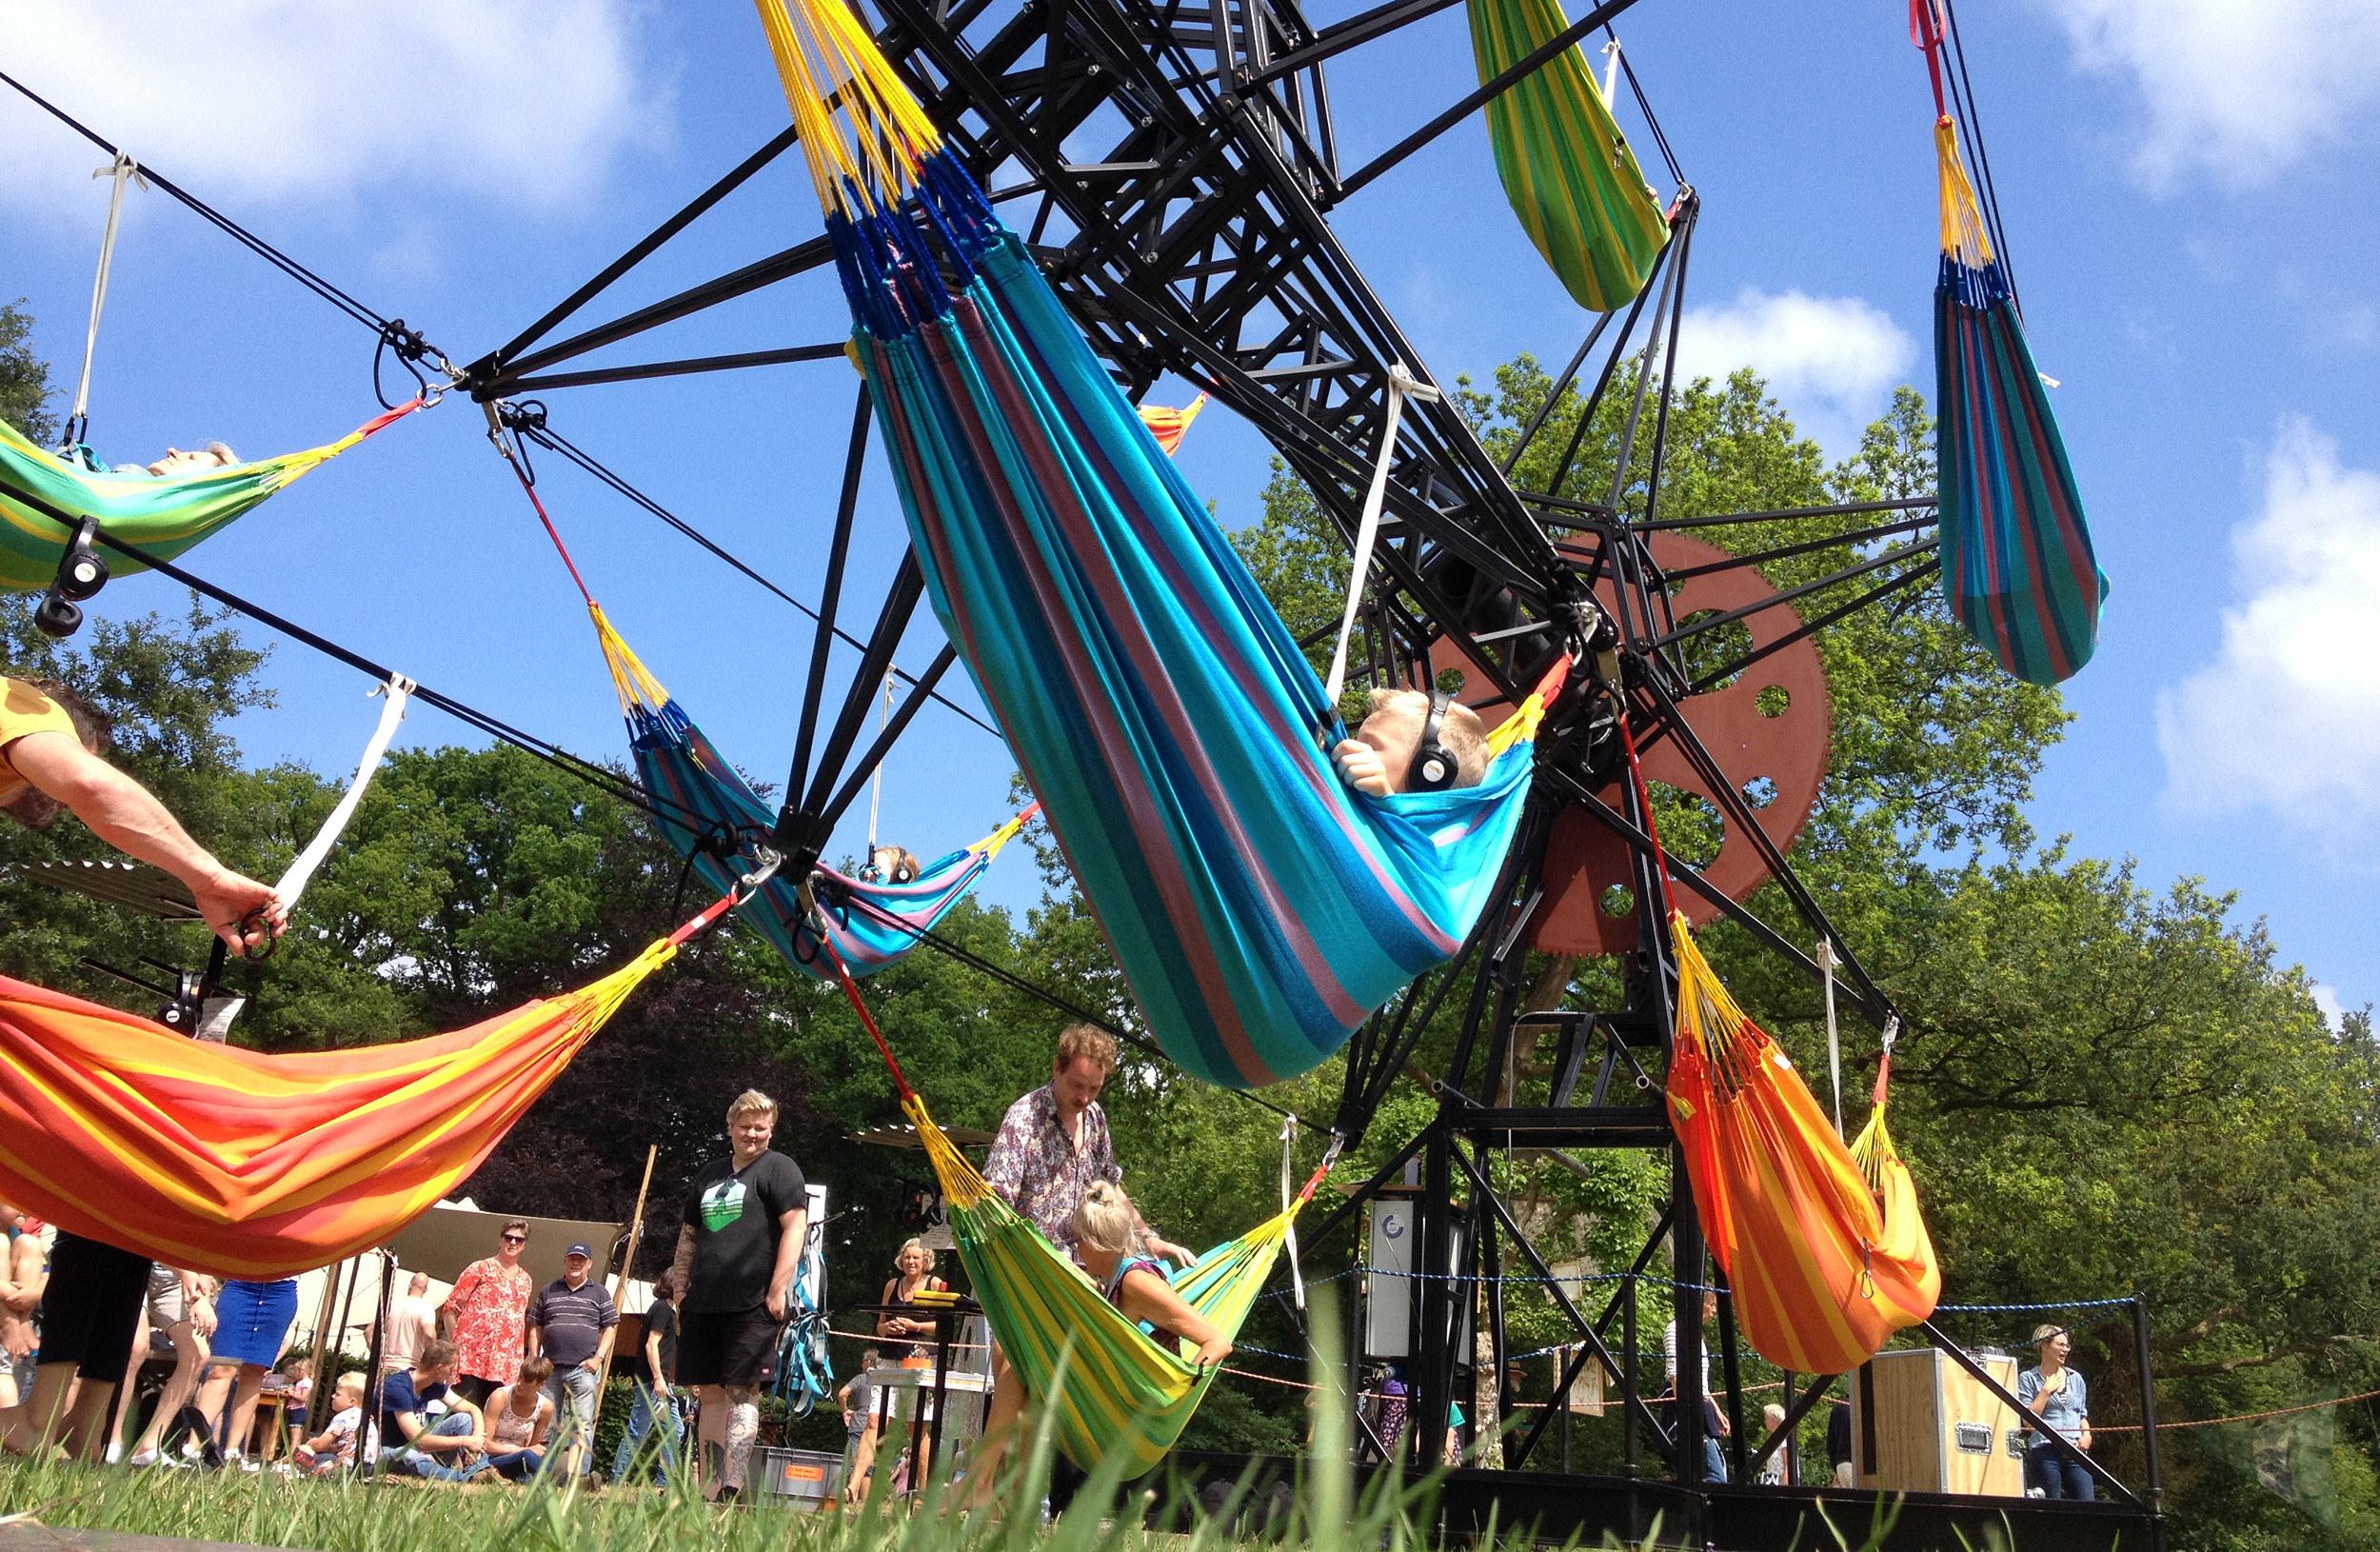 Vierdaagsefeesten maken Nijmegen dé Zomerhoofdstad!